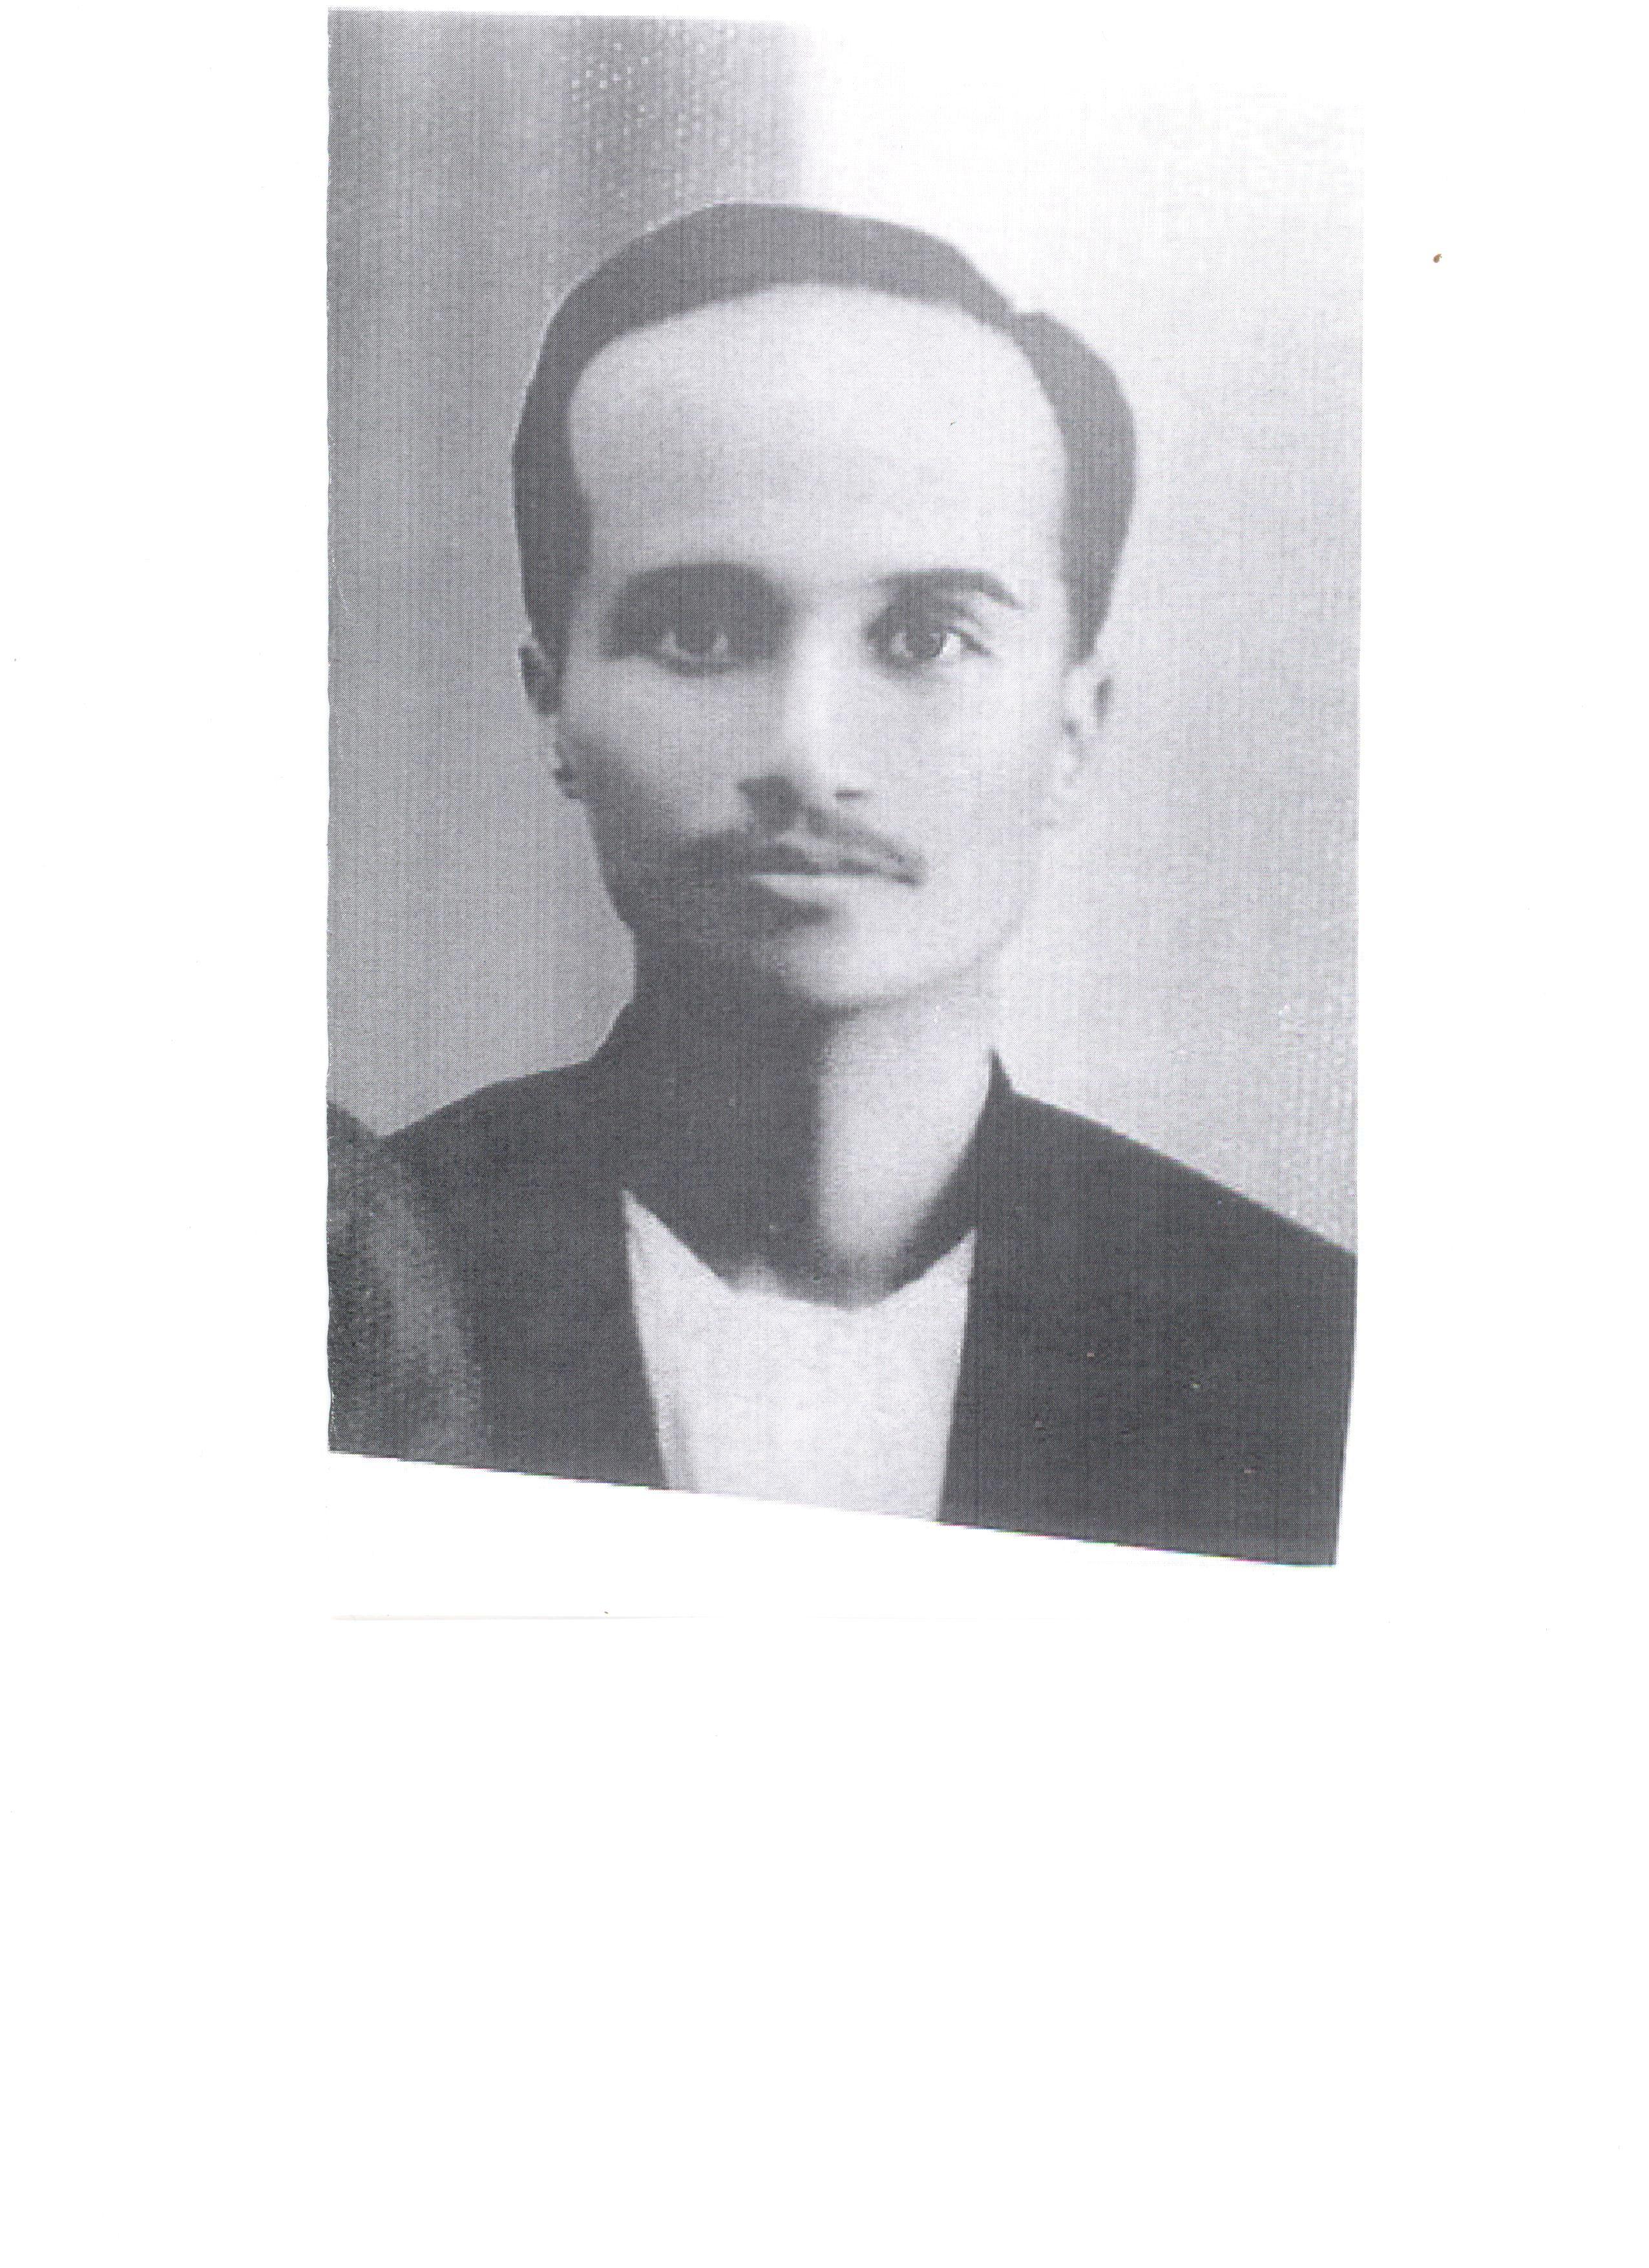 Truong Thi Nguyen